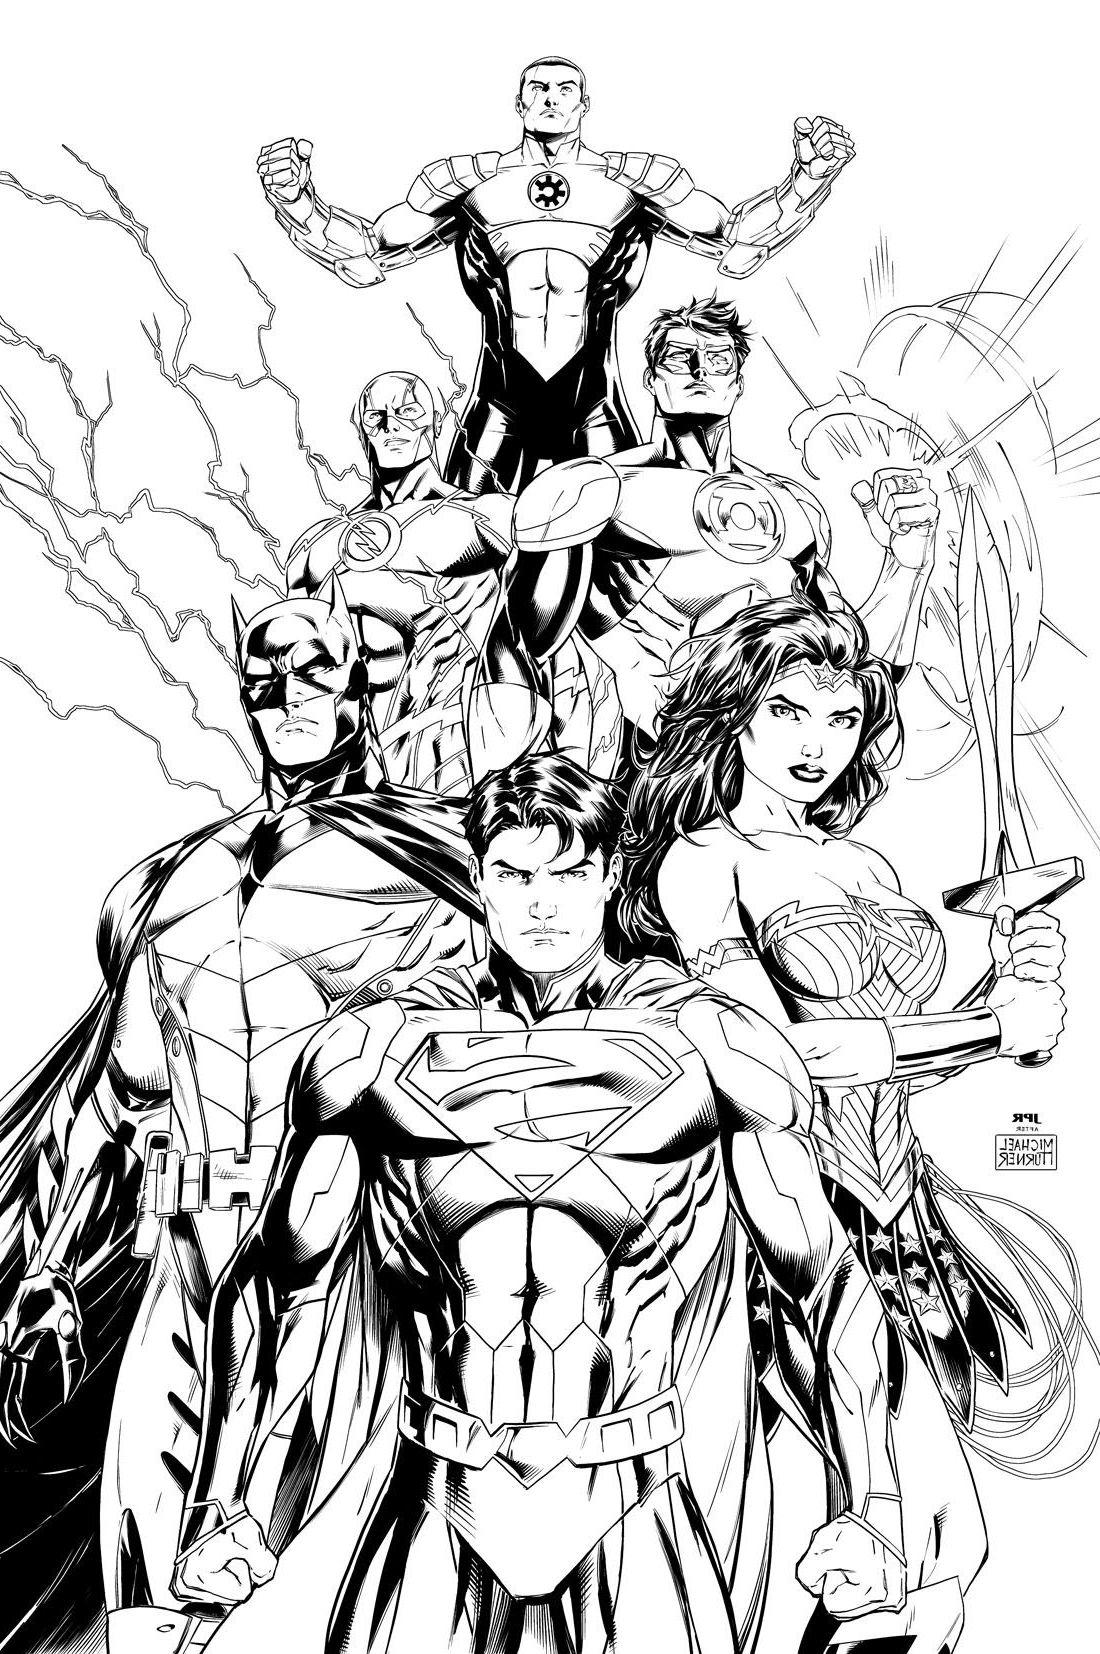 Dc Comics Coloring Pages Superhero Coloring Pages Superhero Coloring Avengers Coloring Pages